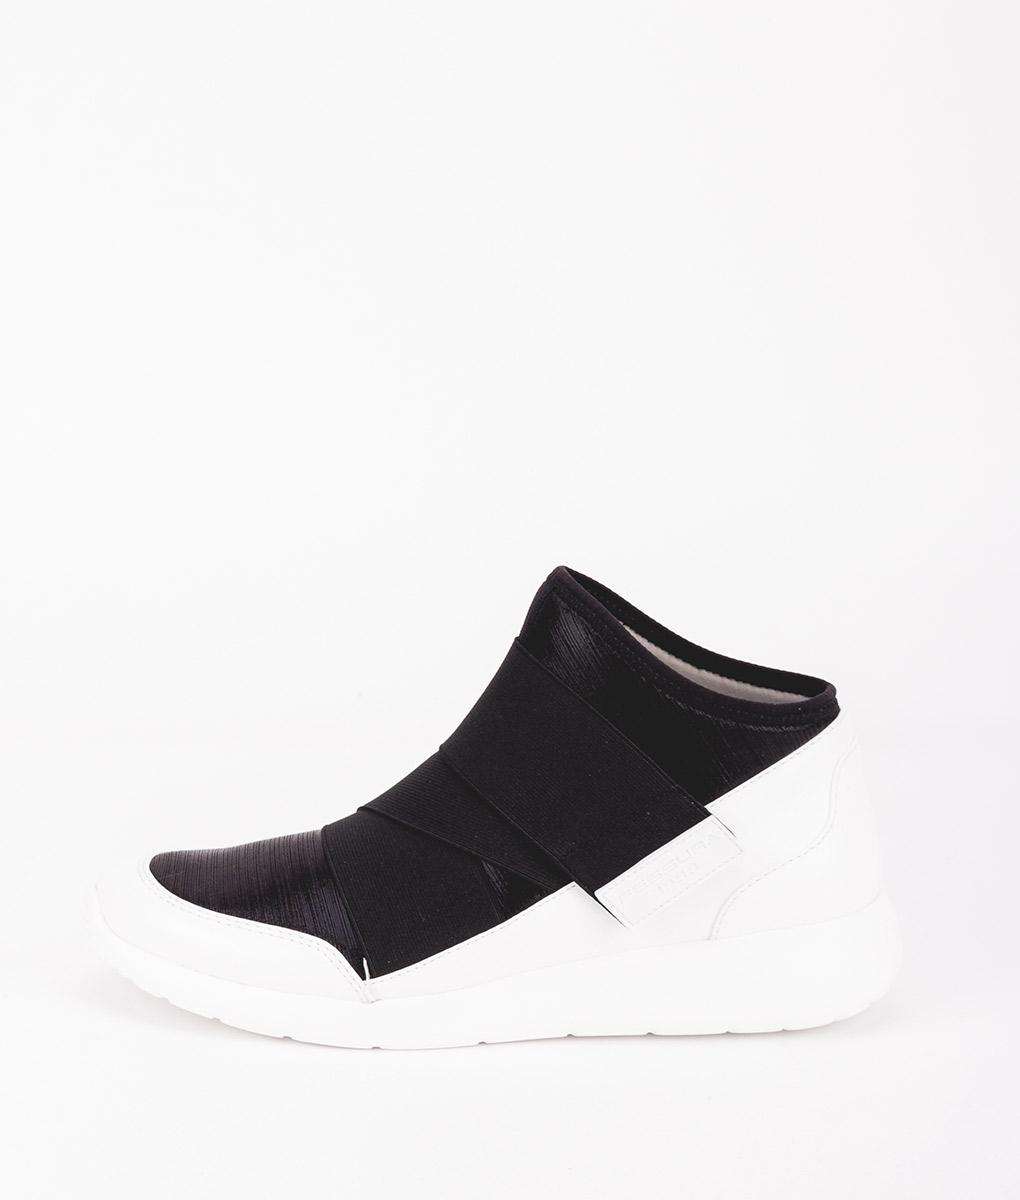 FESSURA Women Sneakers AIR001 AIRSOCK BAND, White Black 149.99 2